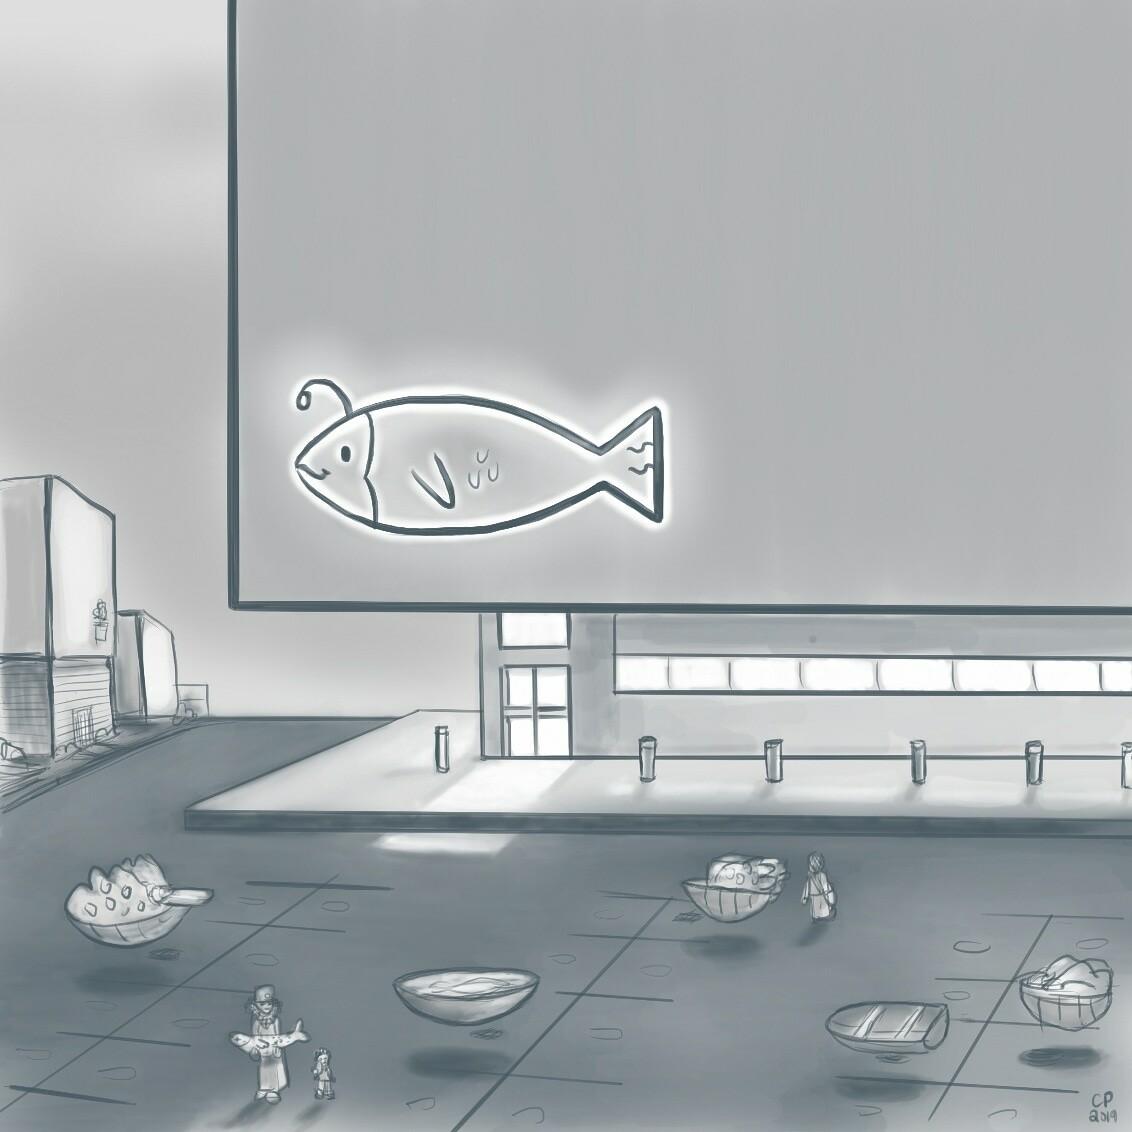 25 Fish Market